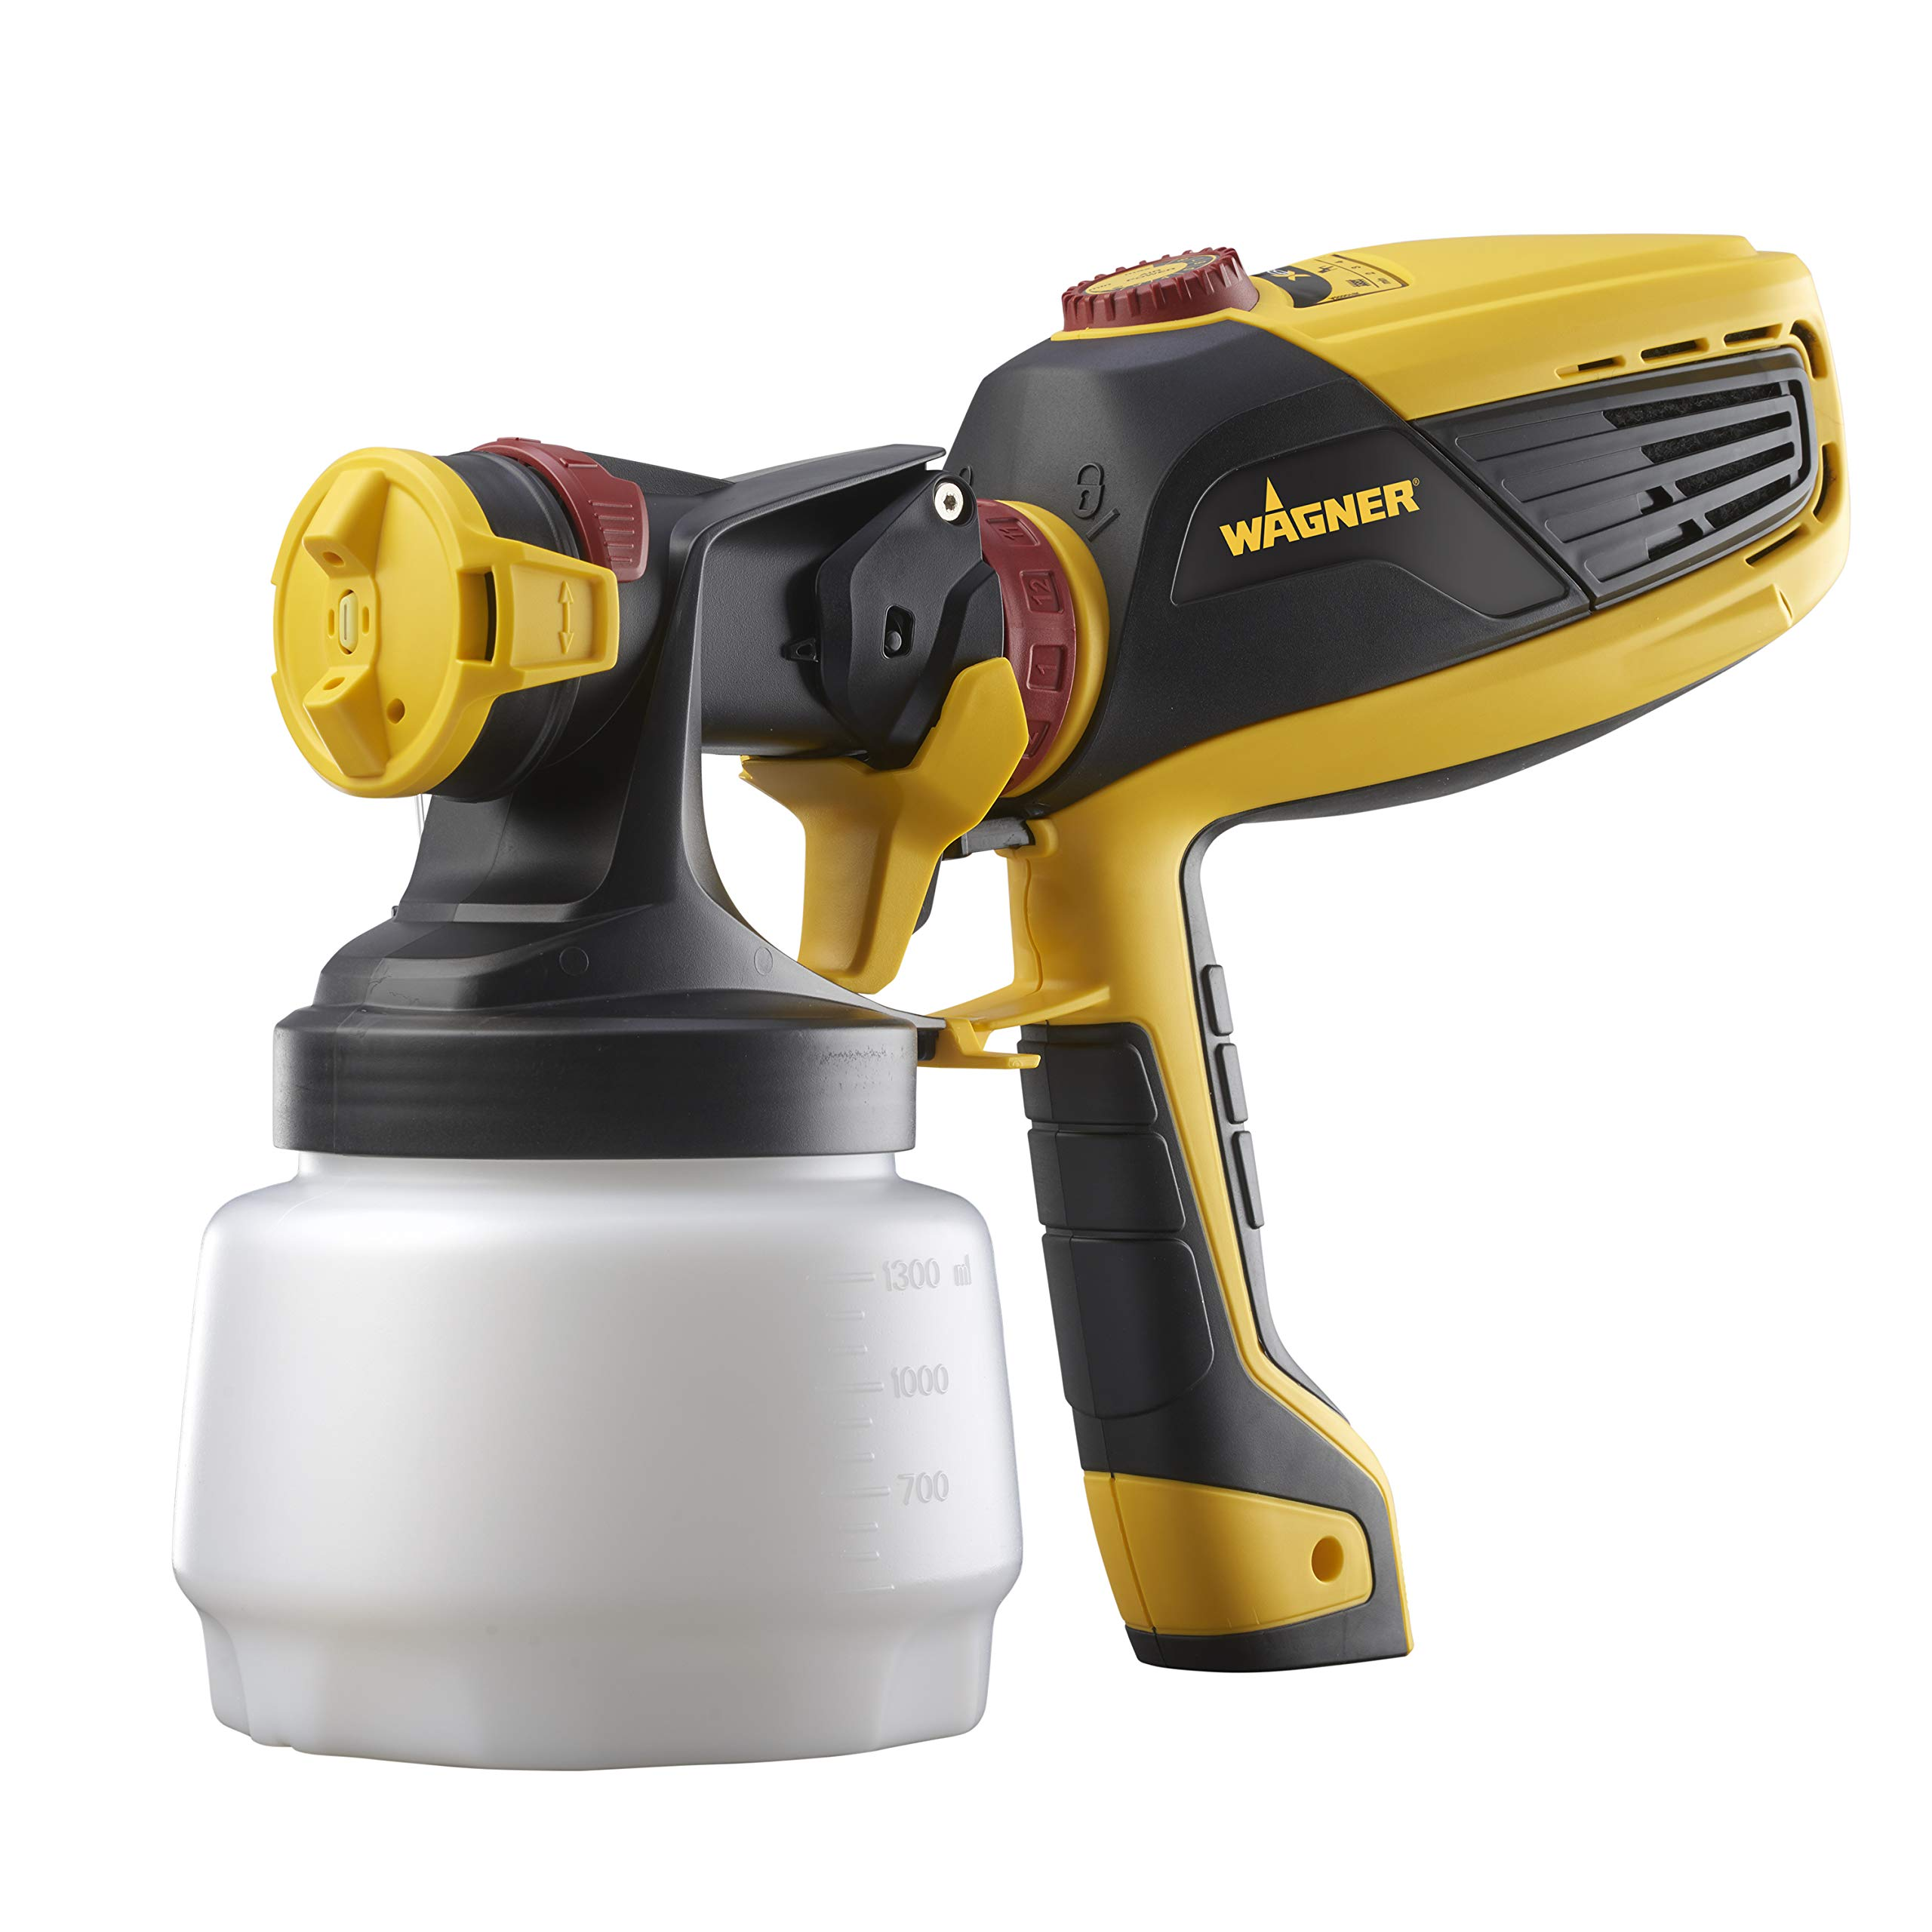 Wagner Spraytech 0529010 FLEXiO 590 HVLP Paint Sprayer, by Wagner Spraytech